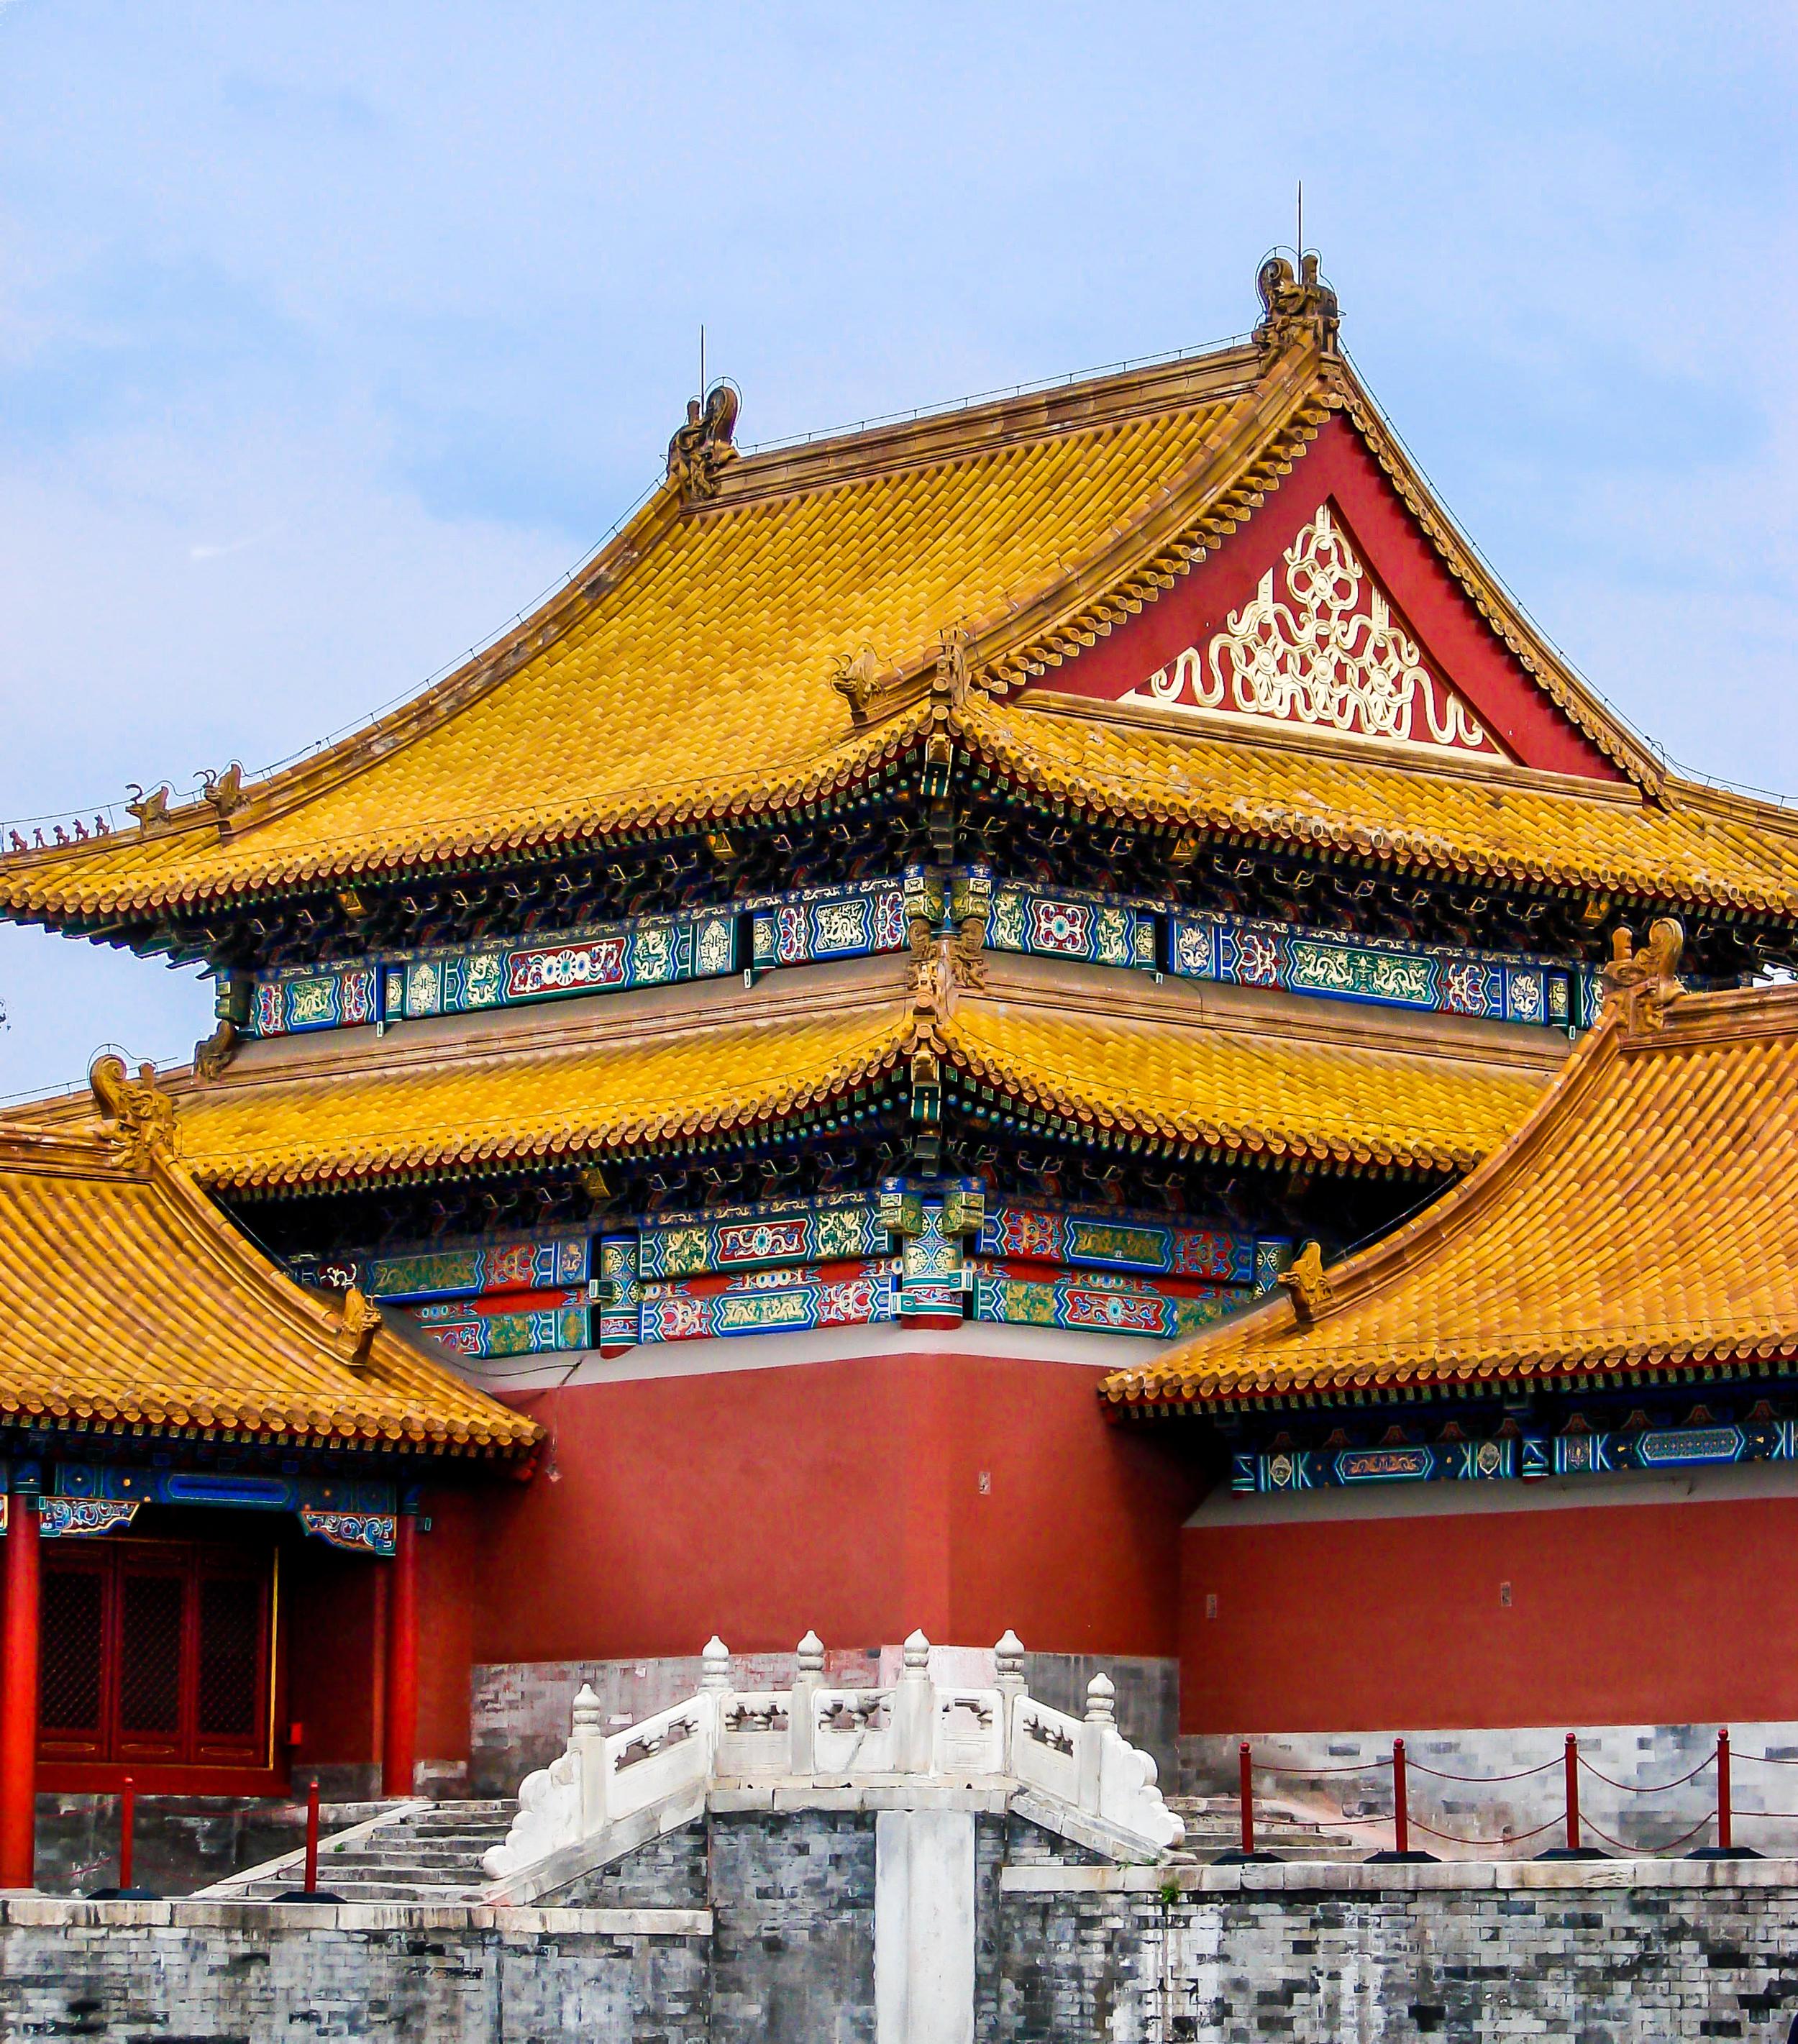 Ming Majesty - Forbidden City (China)